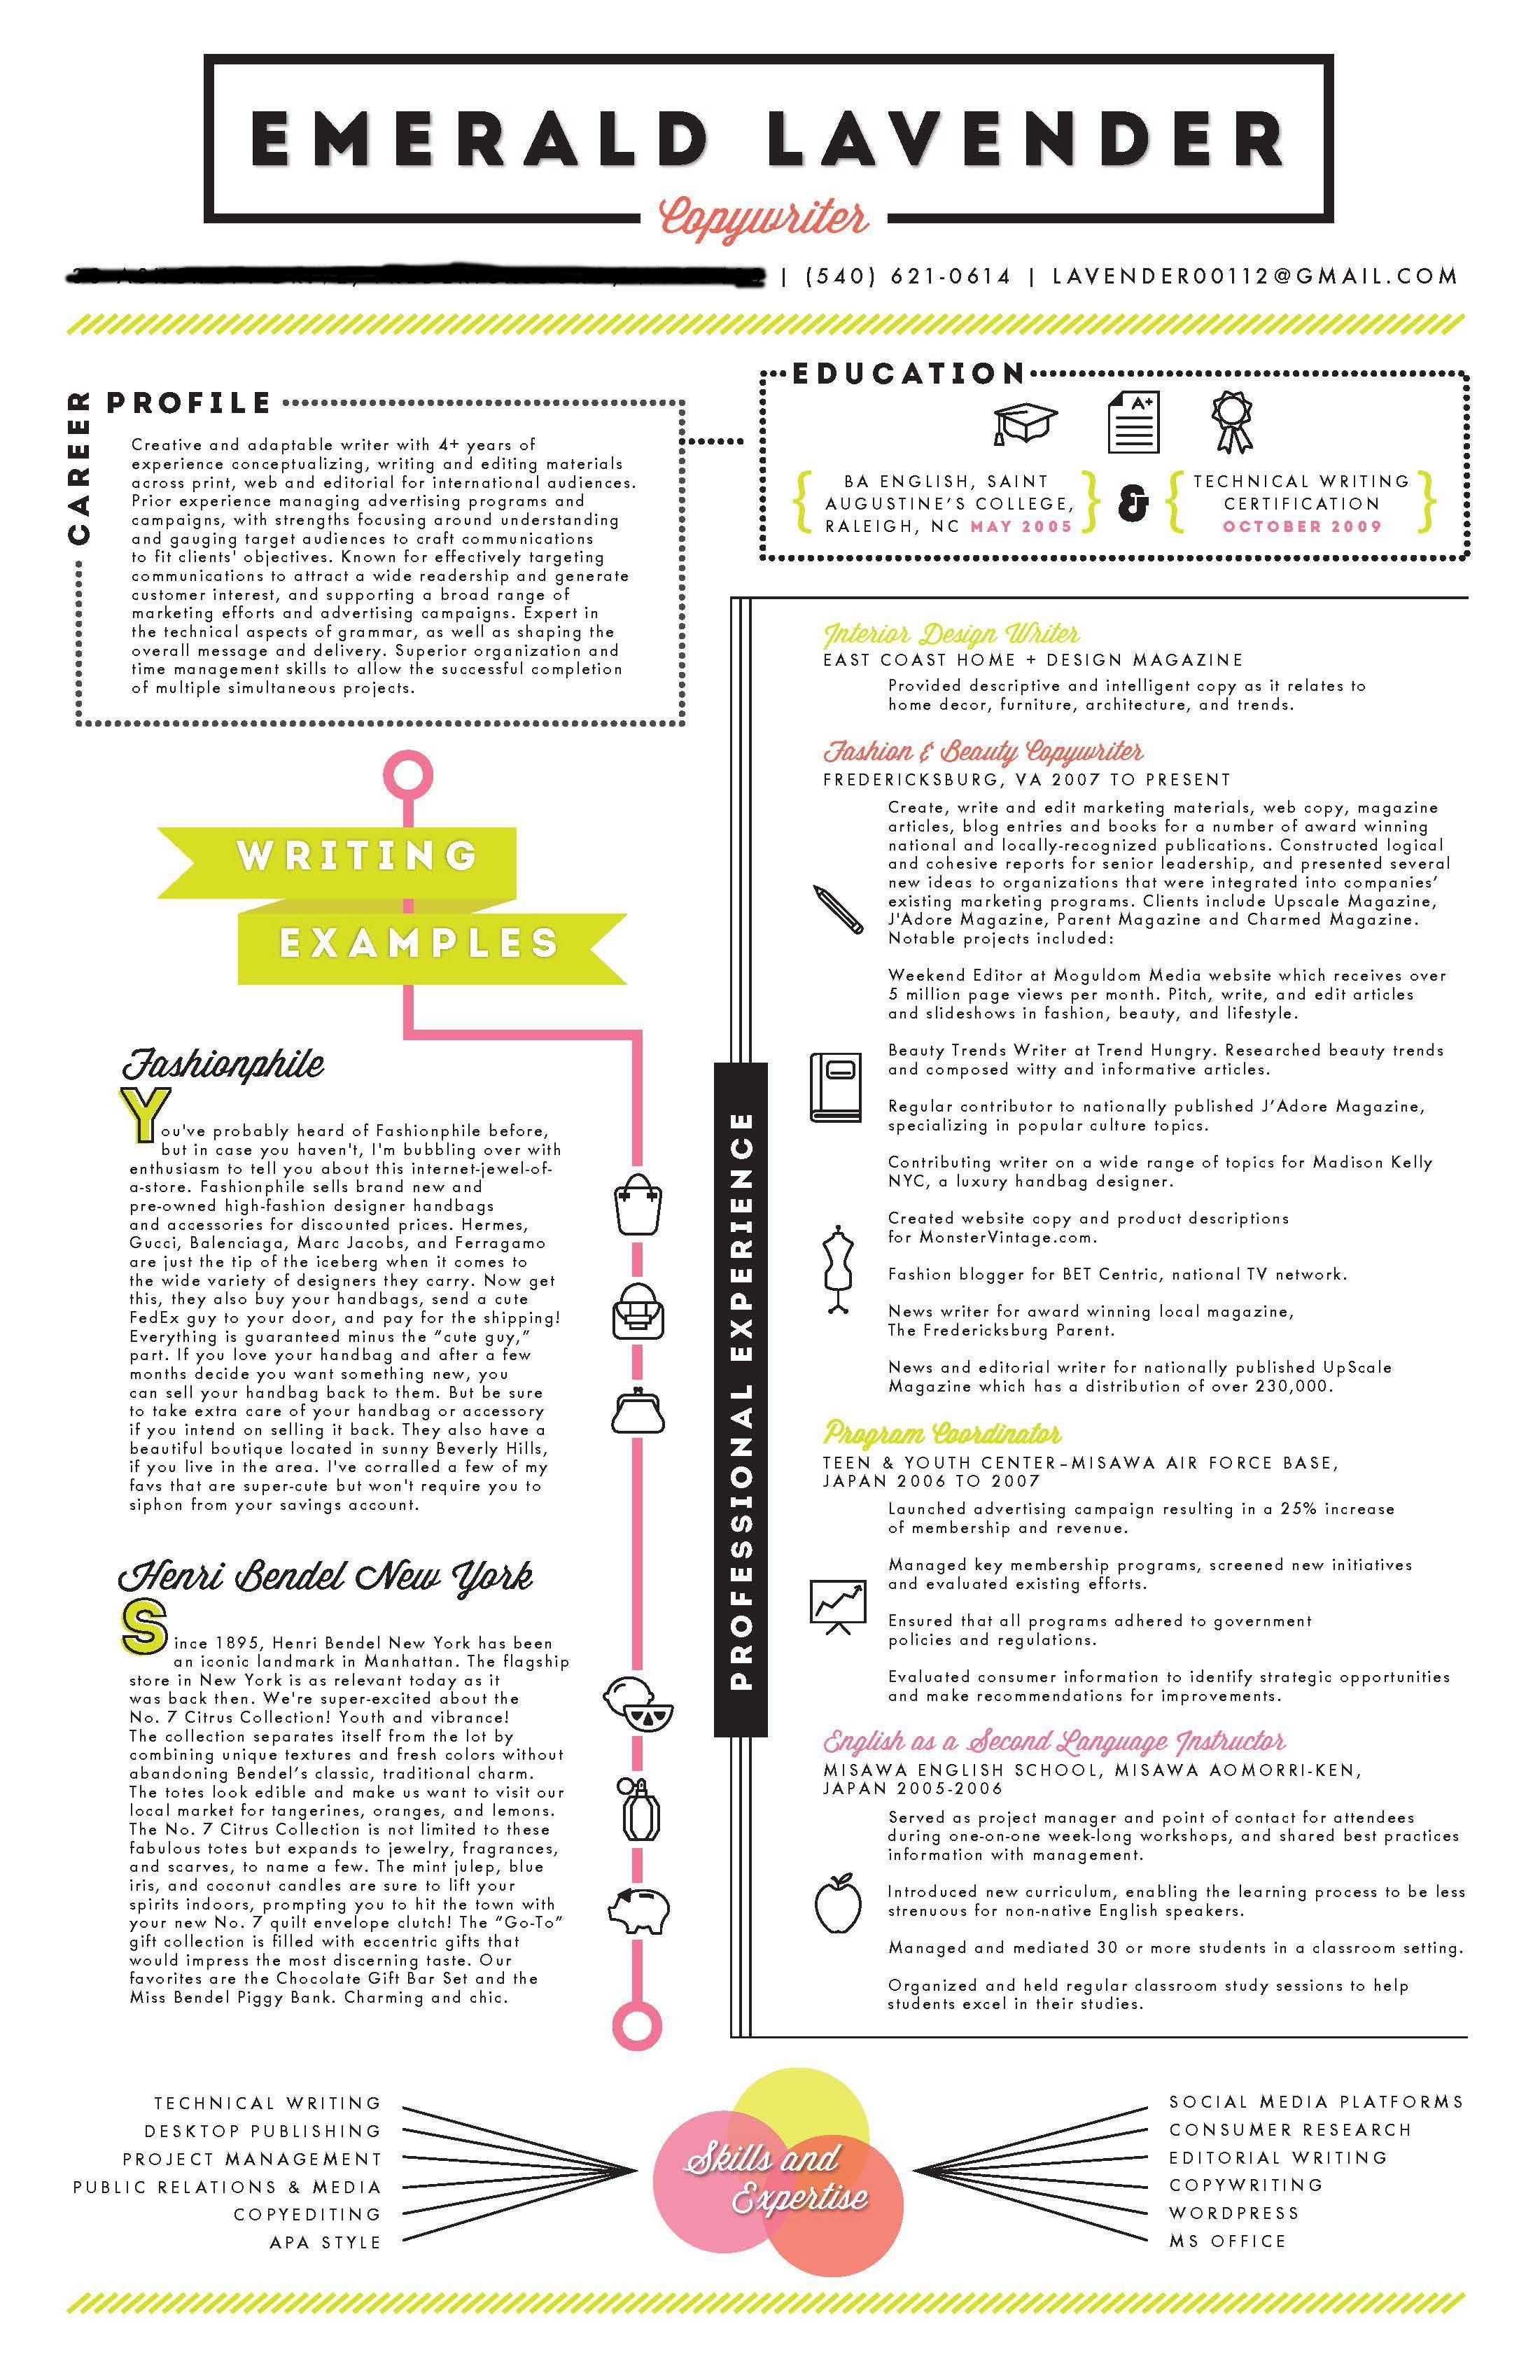 Lavender Emerald copy Design Stuffs Pinterest